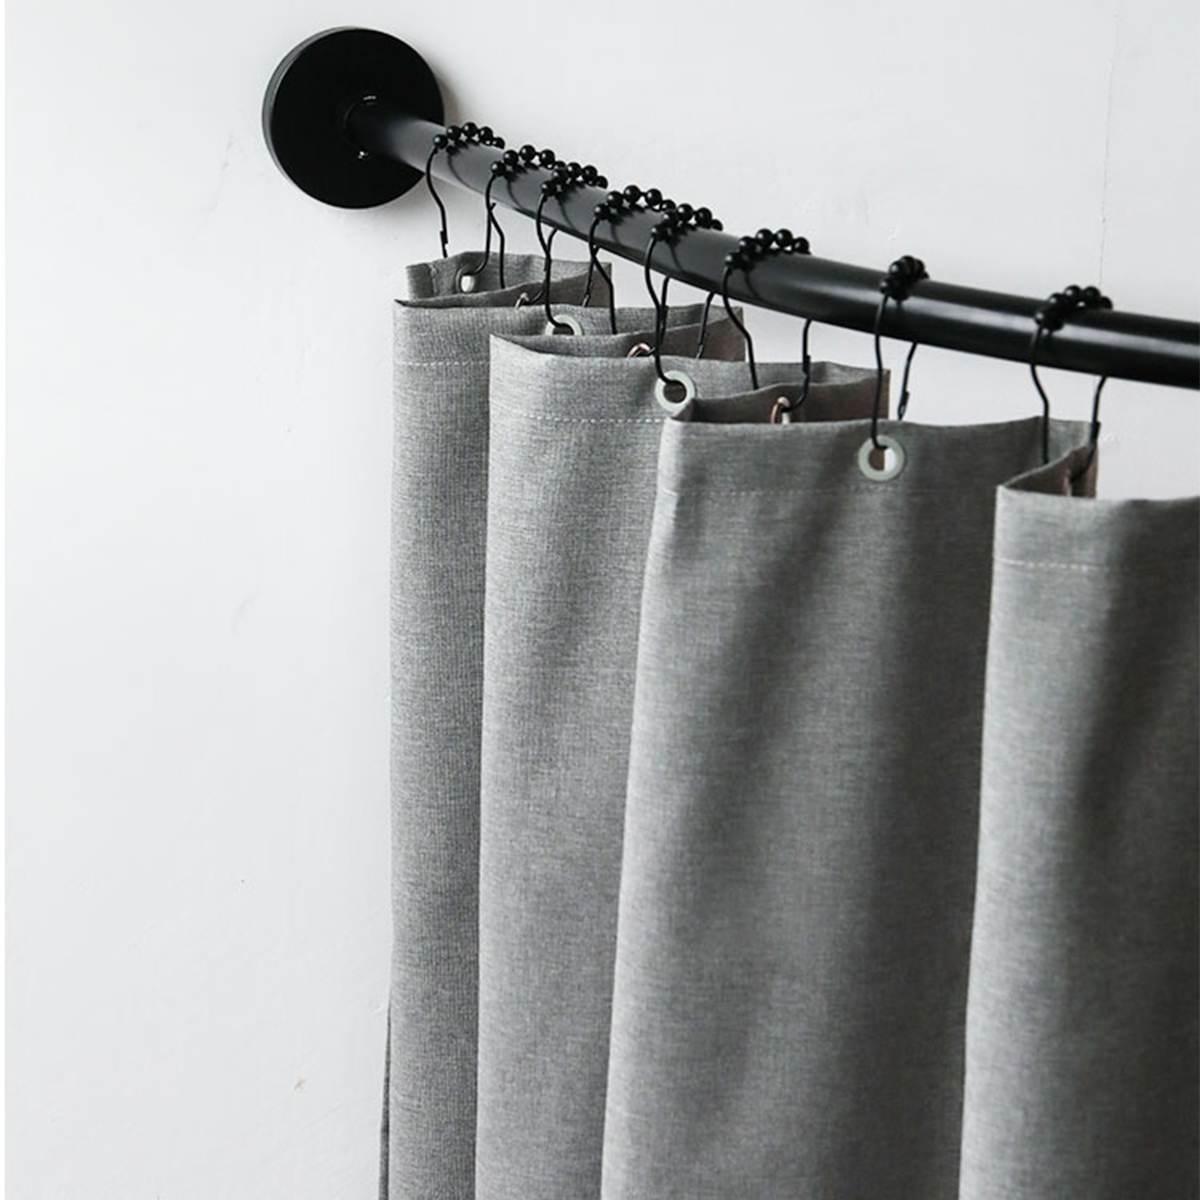 Extendable Corner Shower Curtain Rod Pole Black Stainless Steel Rail Rod Bar Bath Door Hardware Heavy Loaded With 12 Metal Hooks enlarge